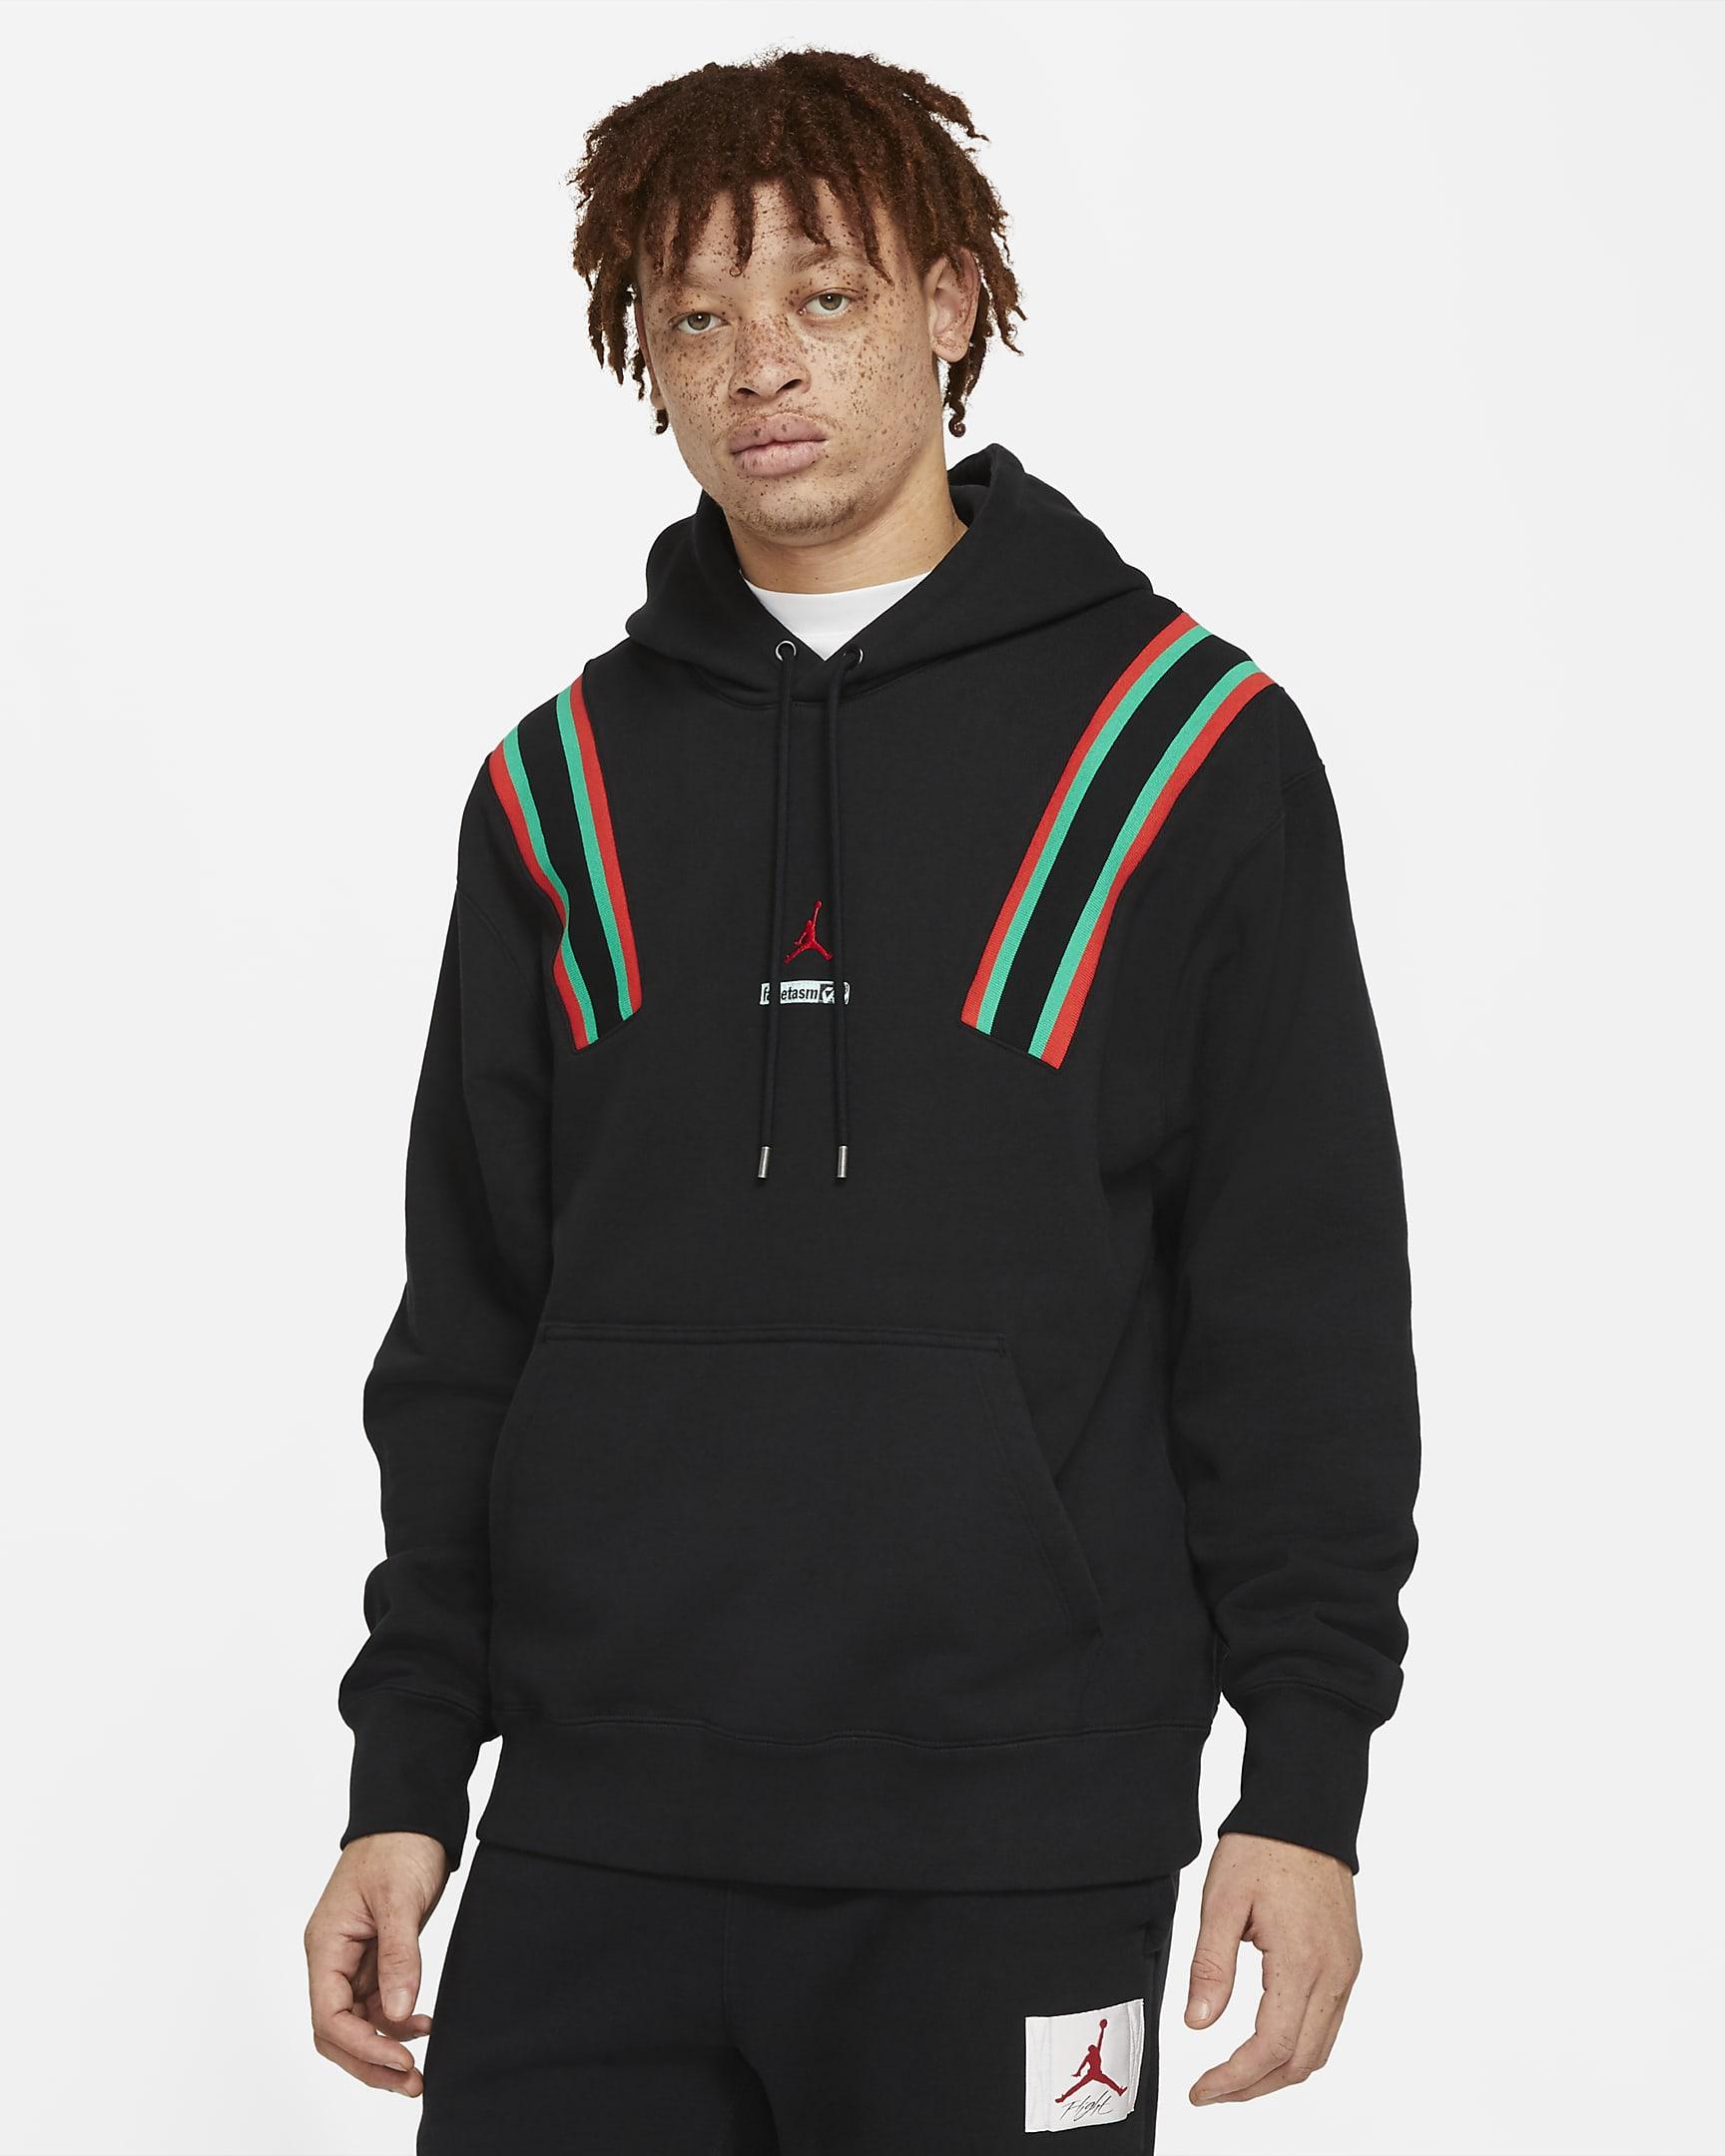 jordan-why-not-x-facetasm-mens-fleece-pullover-hoodie-tvX6tj